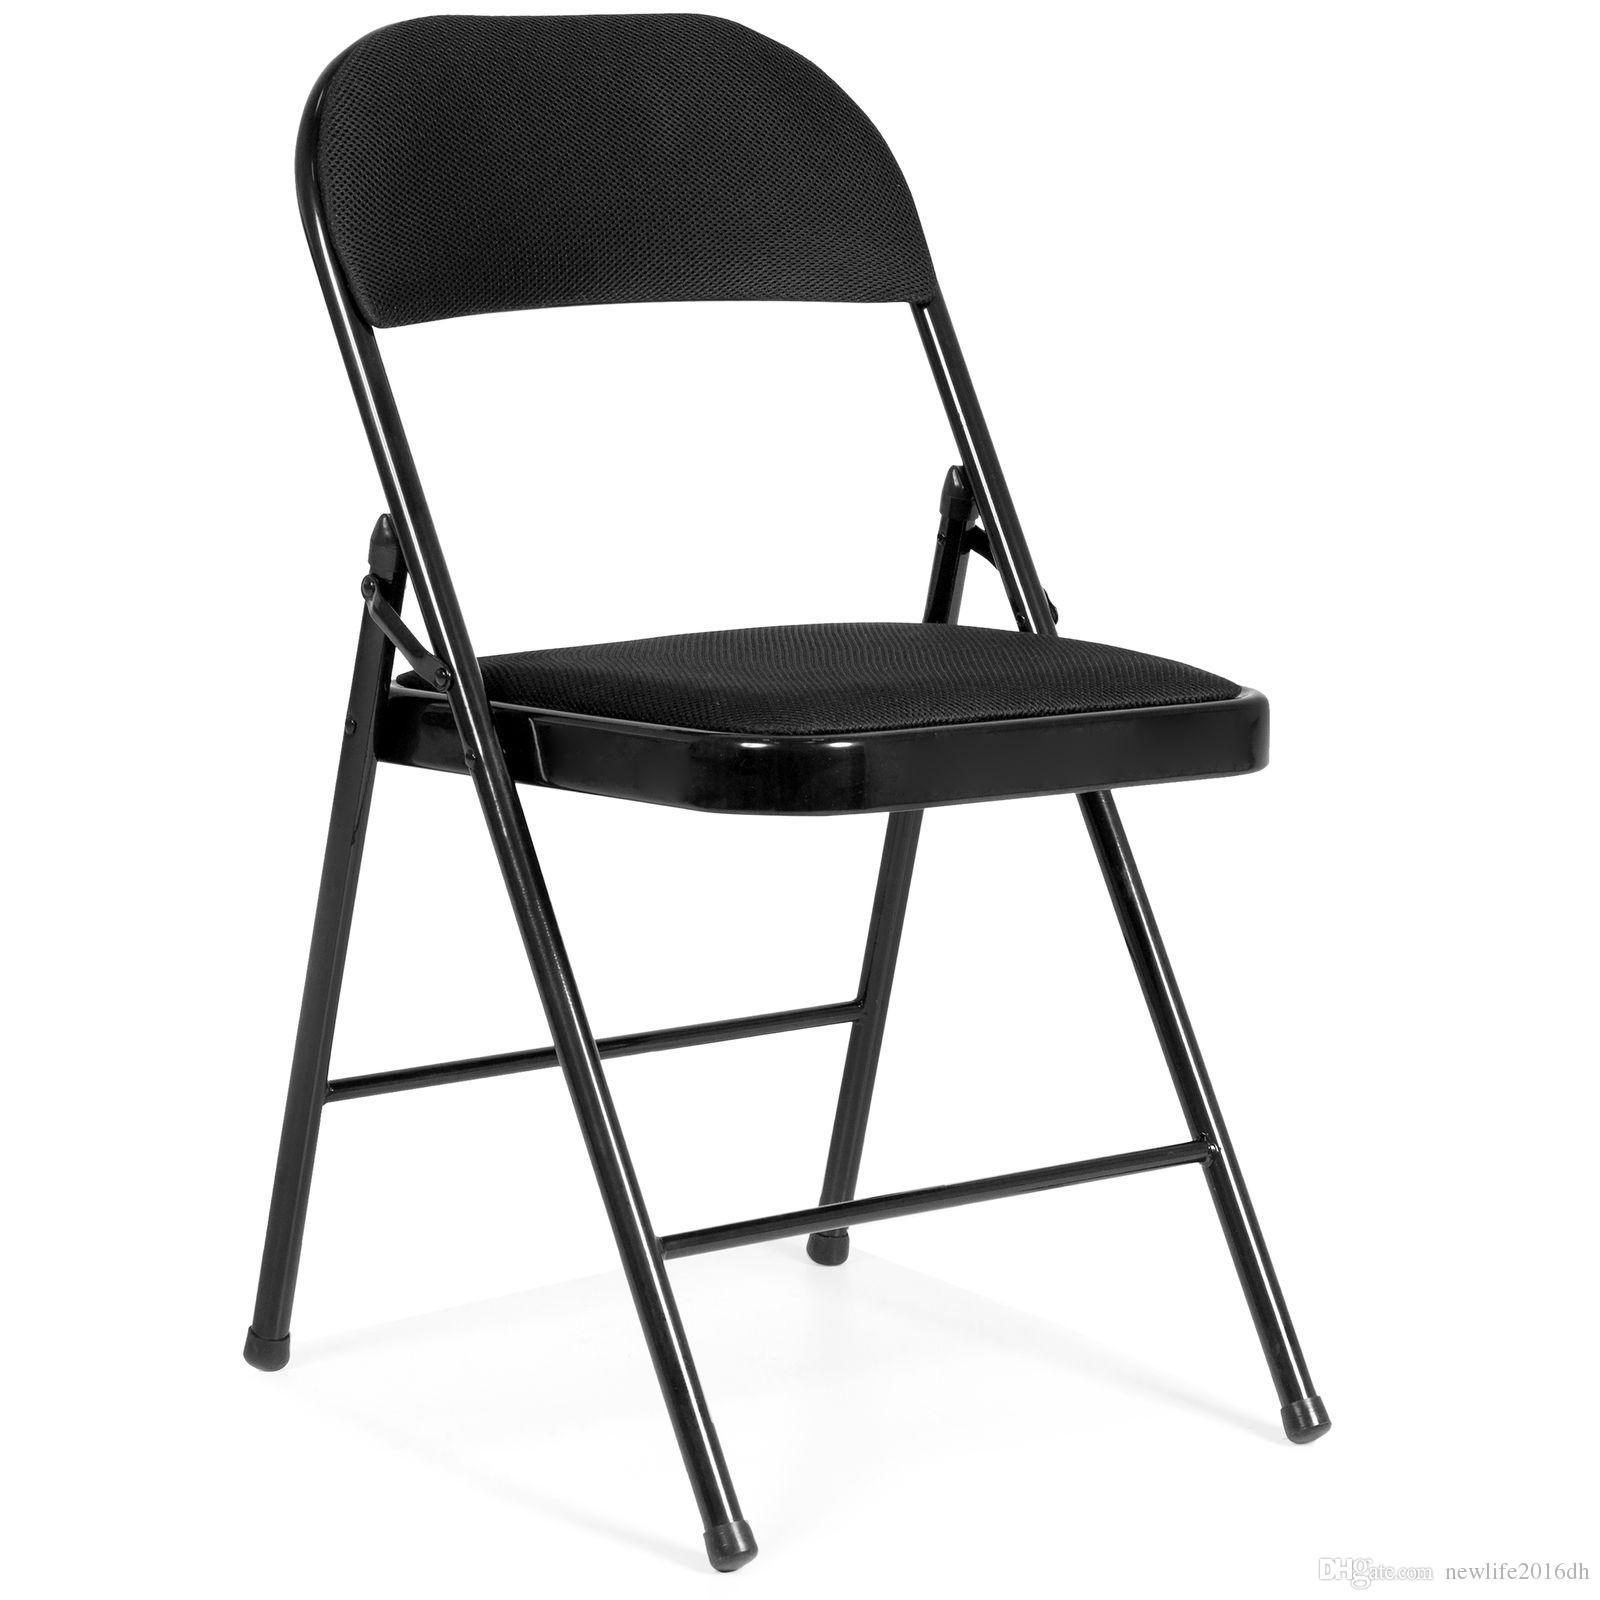 4 Steel Black Fabric Folding Chairs Home fice Furniture